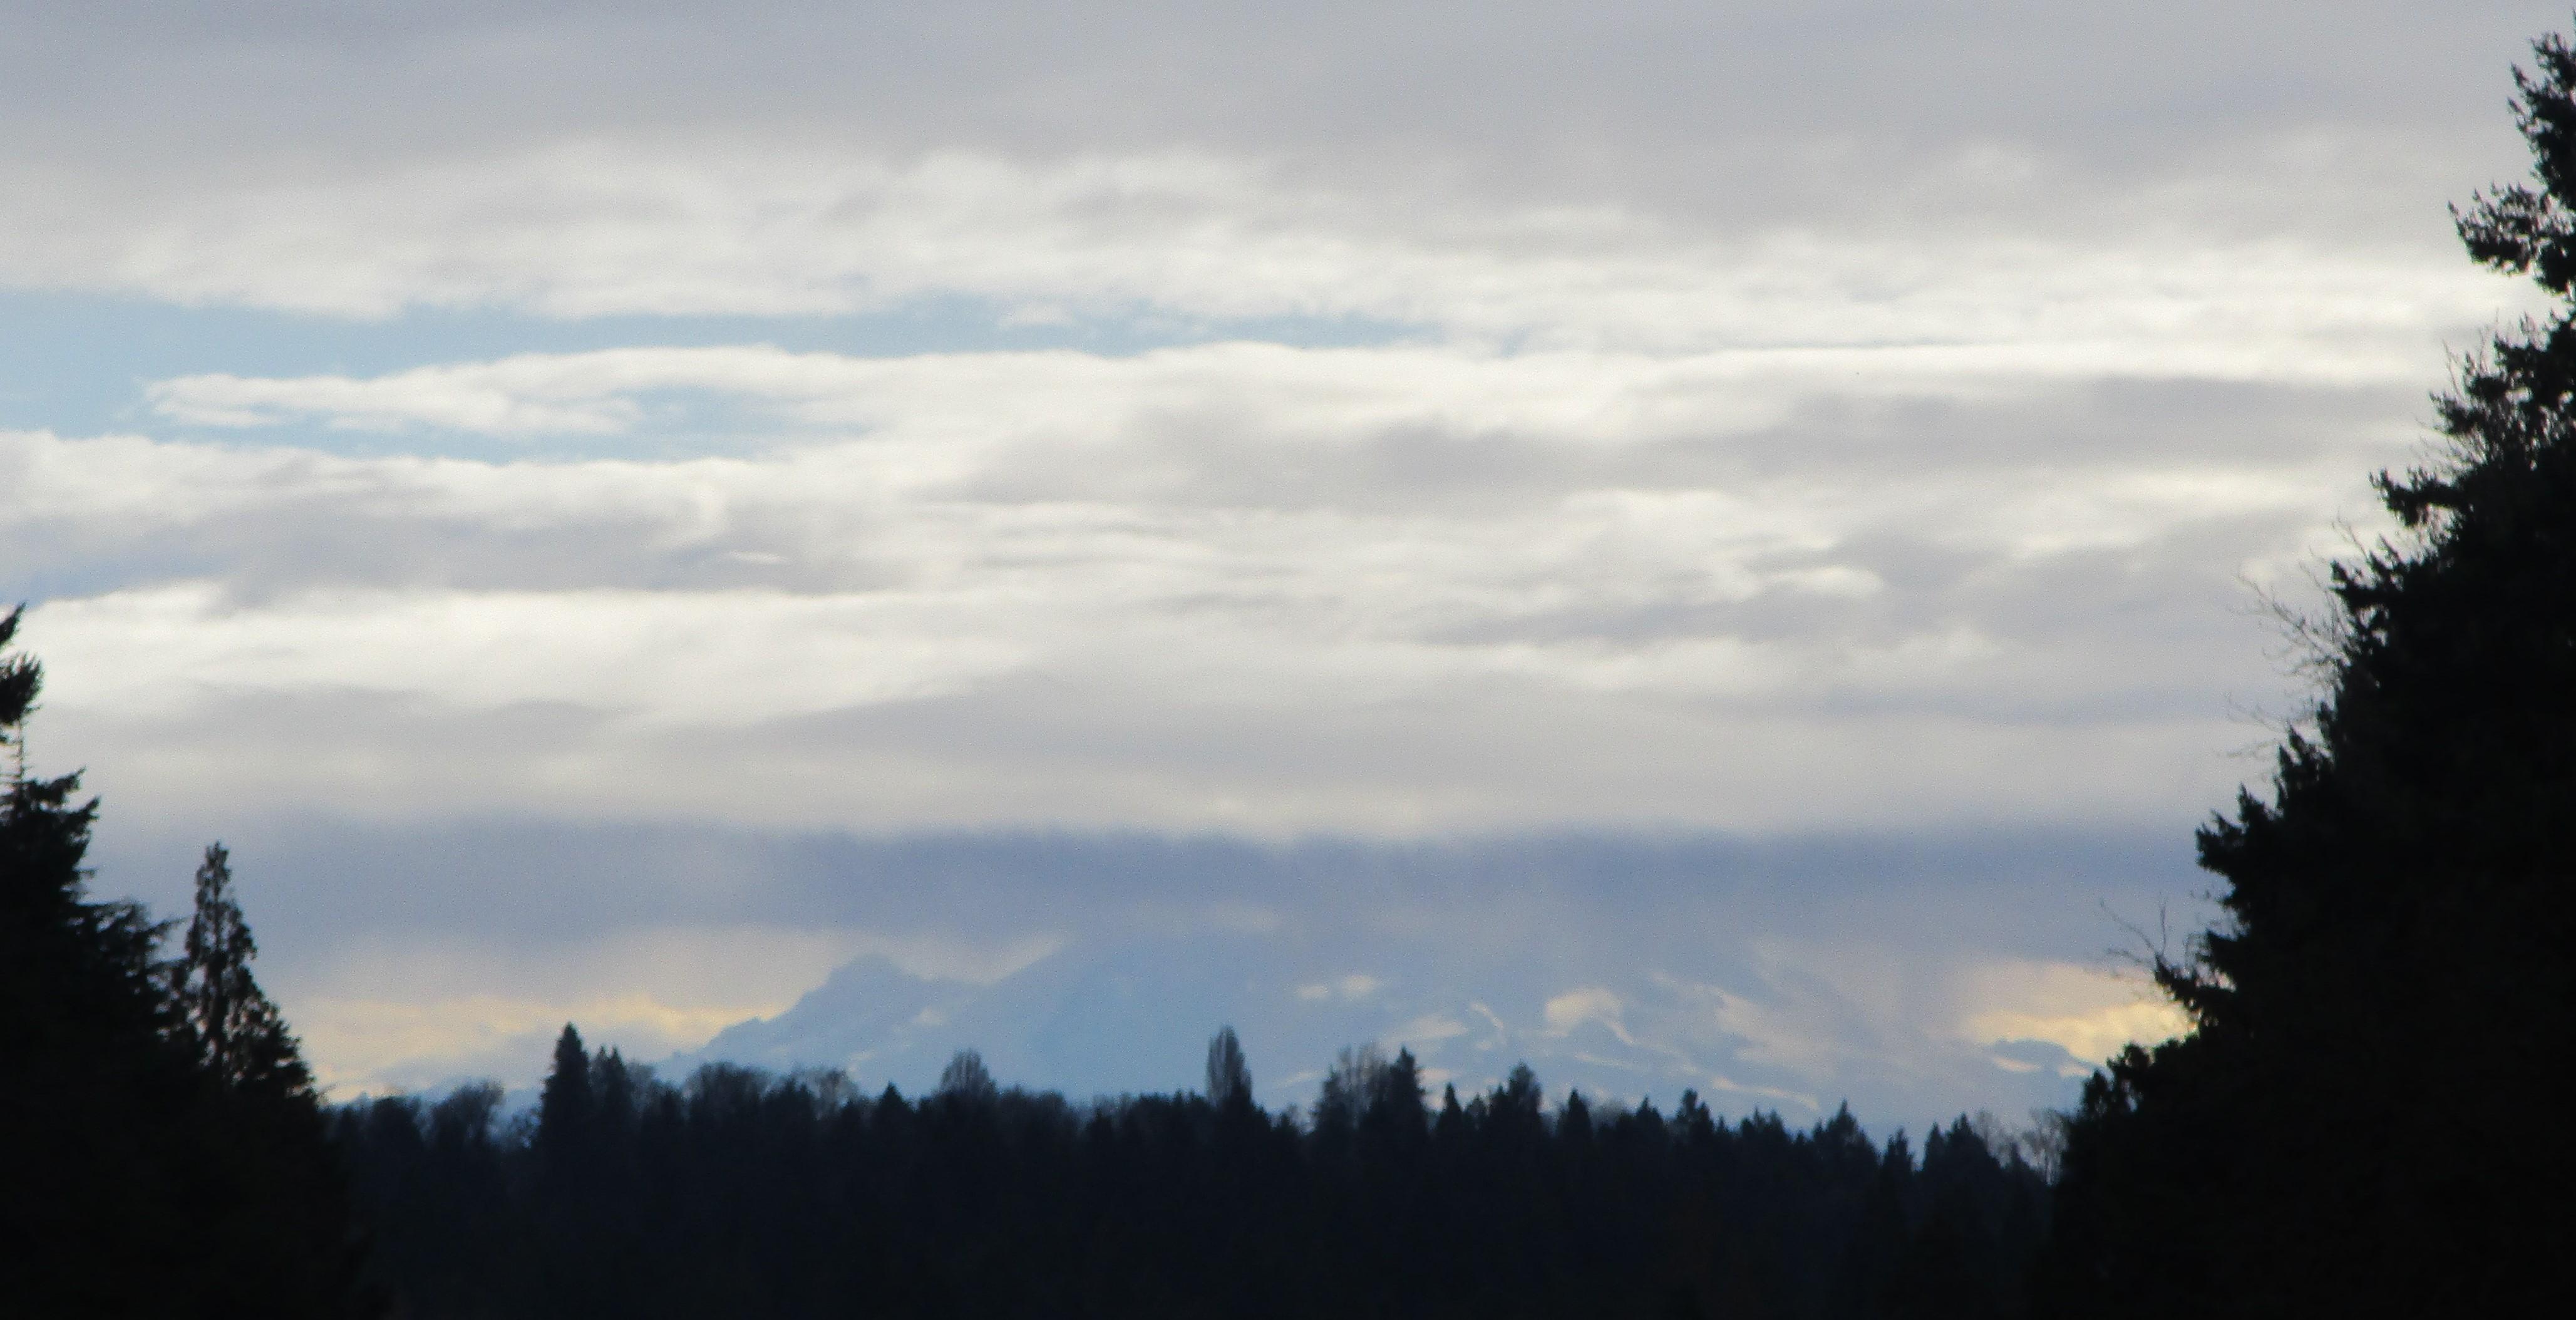 Mount Rainier January 2020